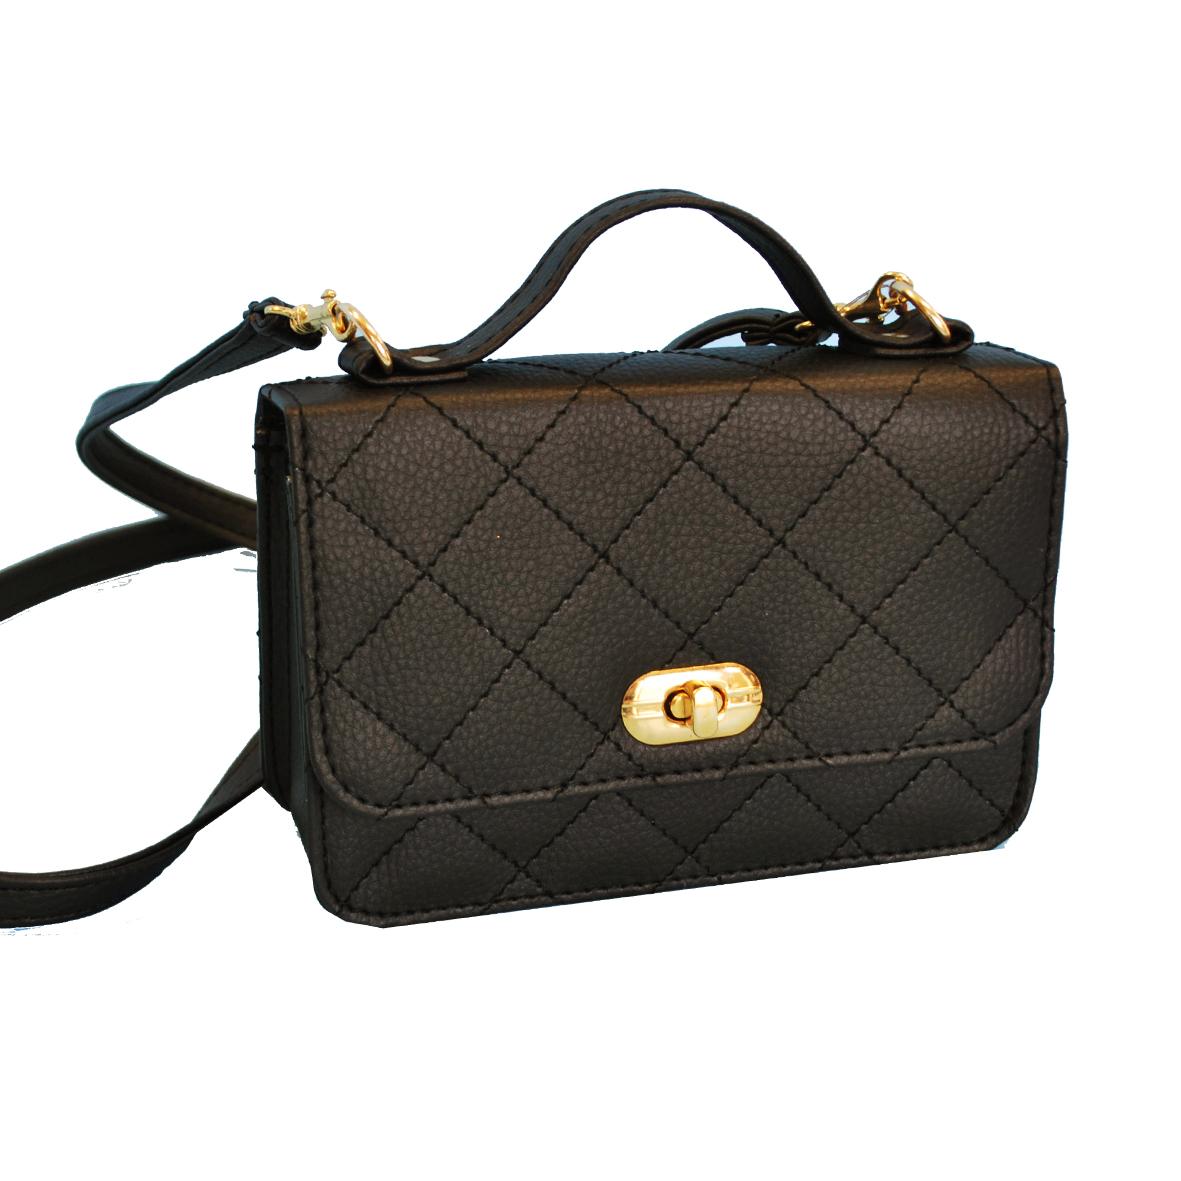 Luxusná dámska kabelka crossbody 8679 v čiernej farbe  af28526431d